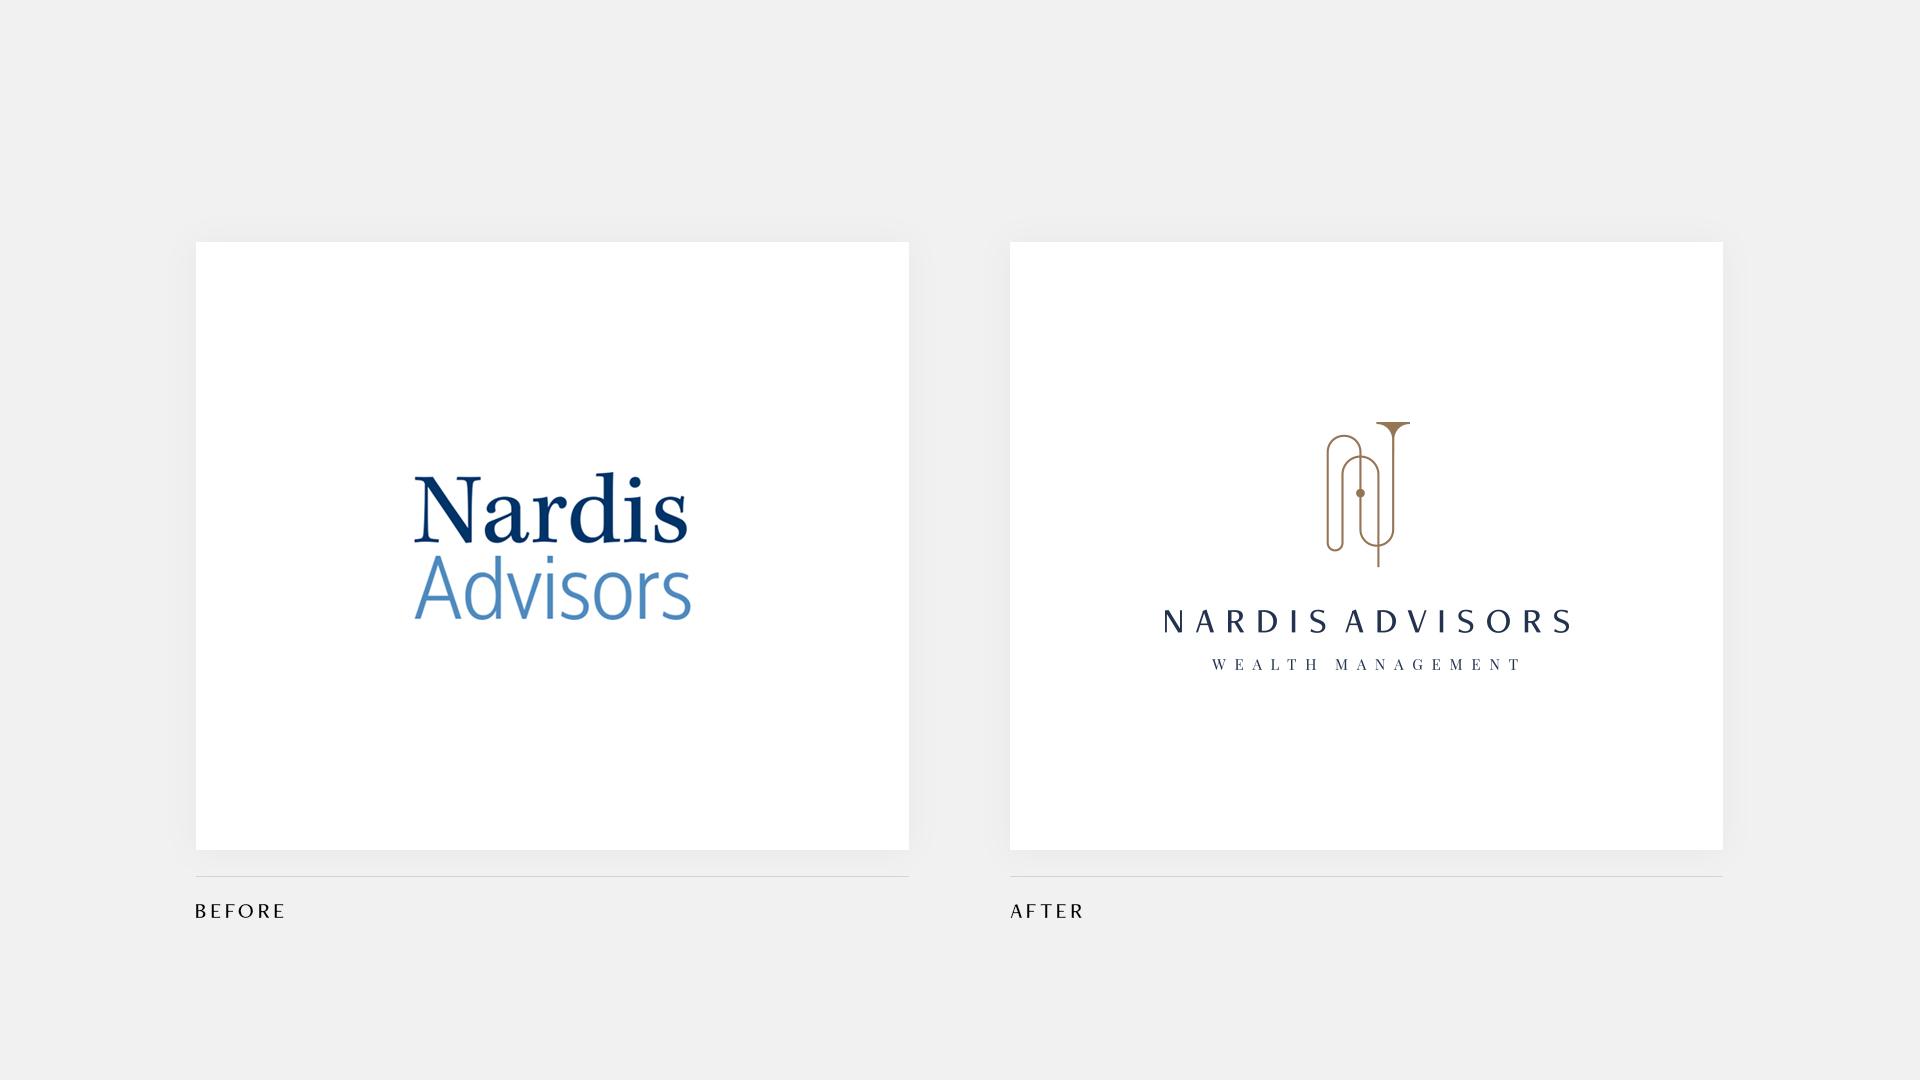 Nardis_BeforeAfter copy.jpg